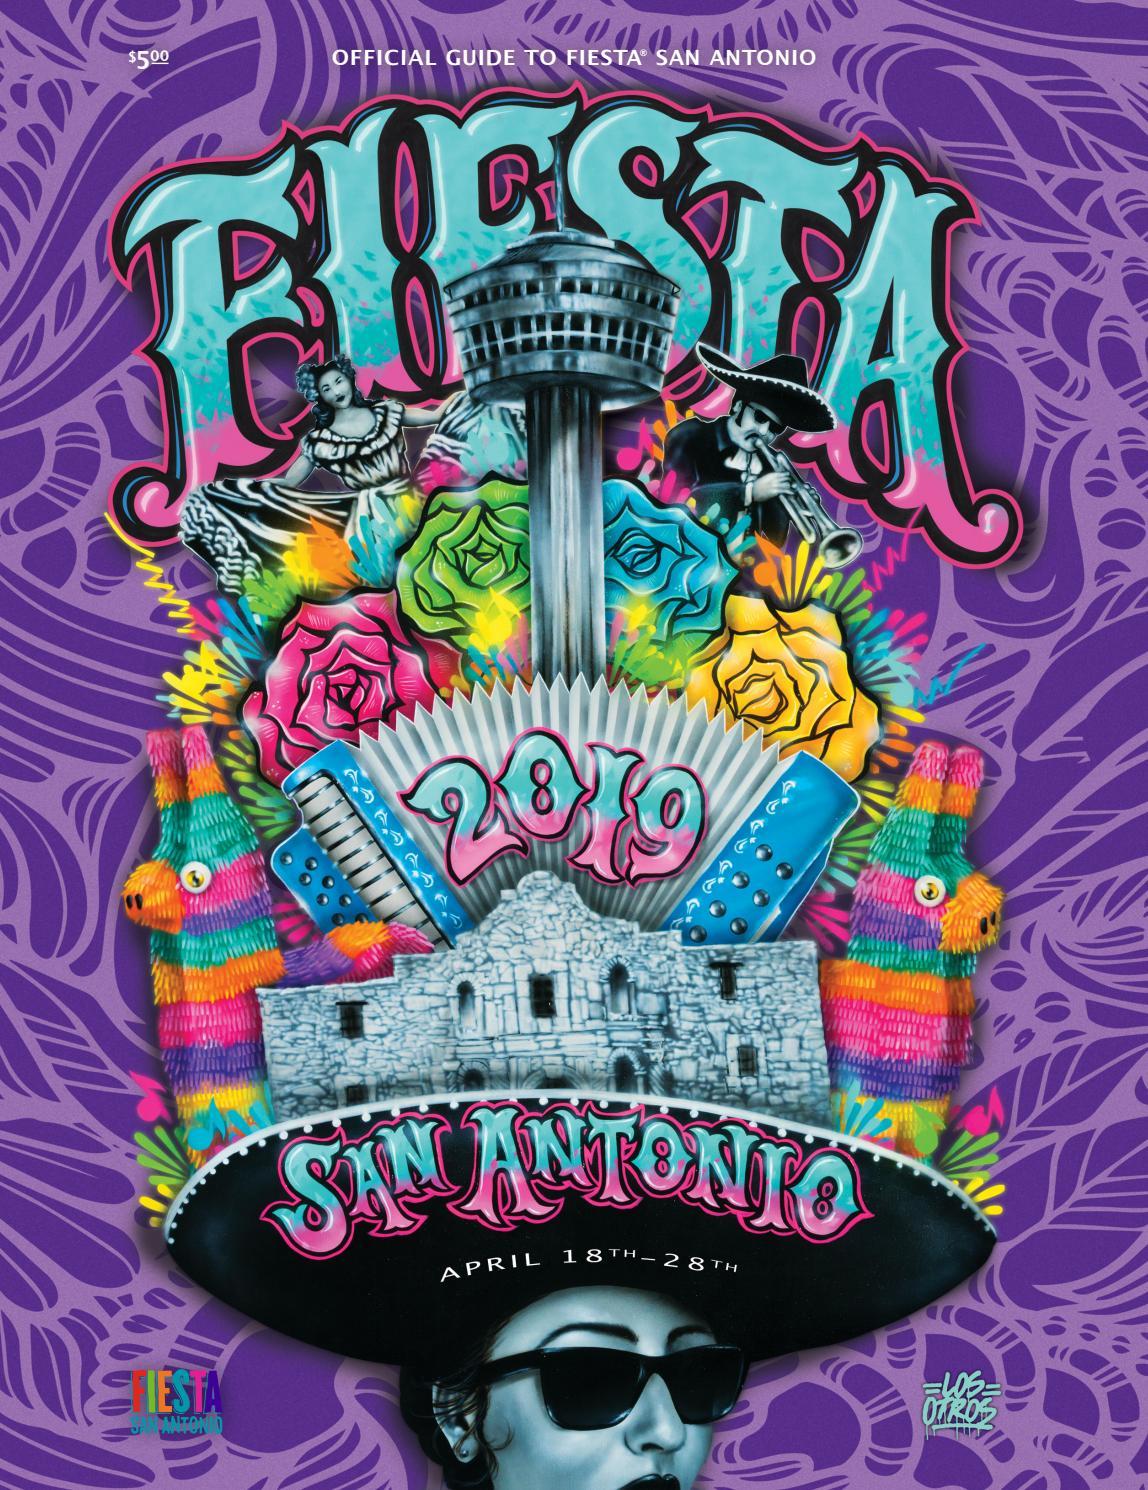 96f3a80ec 2019 Fiesta San Antonio by Traveling Blender - issuu